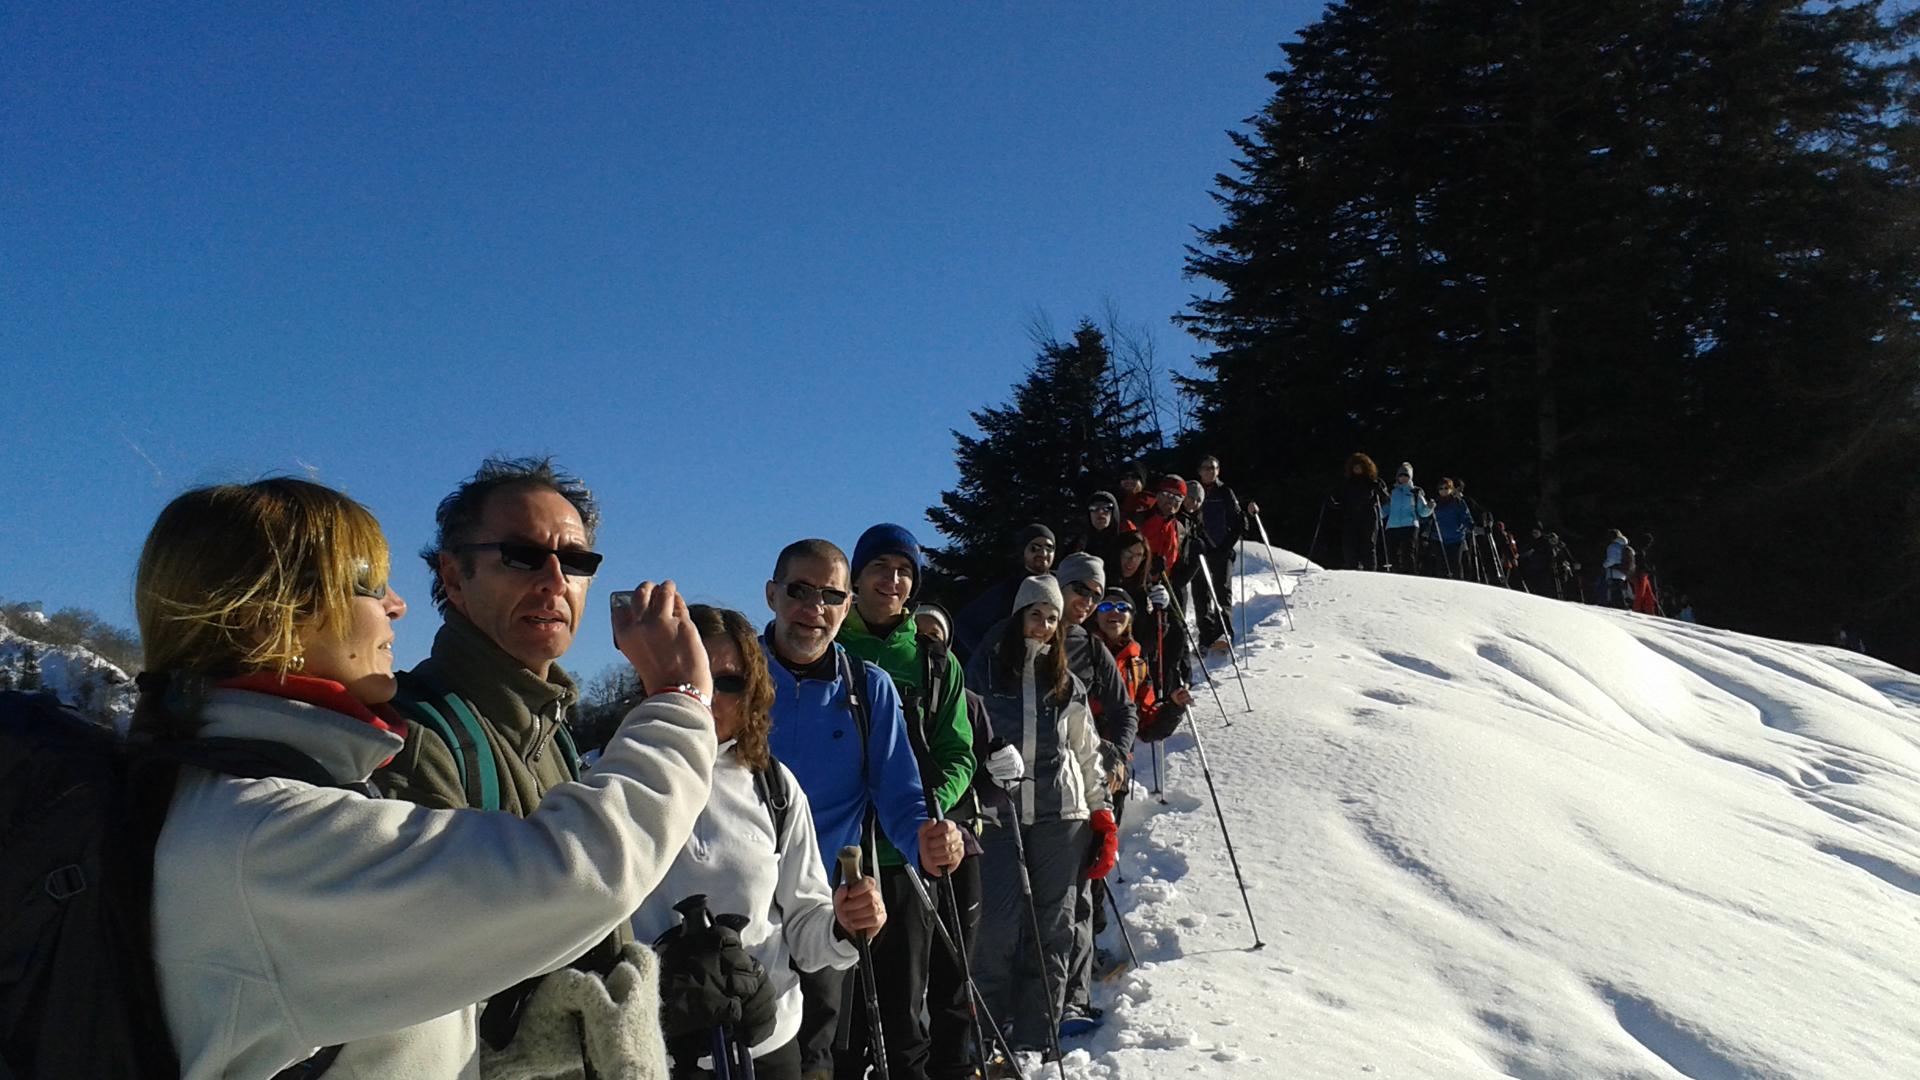 Mountain-Planet-Macugnaga-ciaspole-capodanno